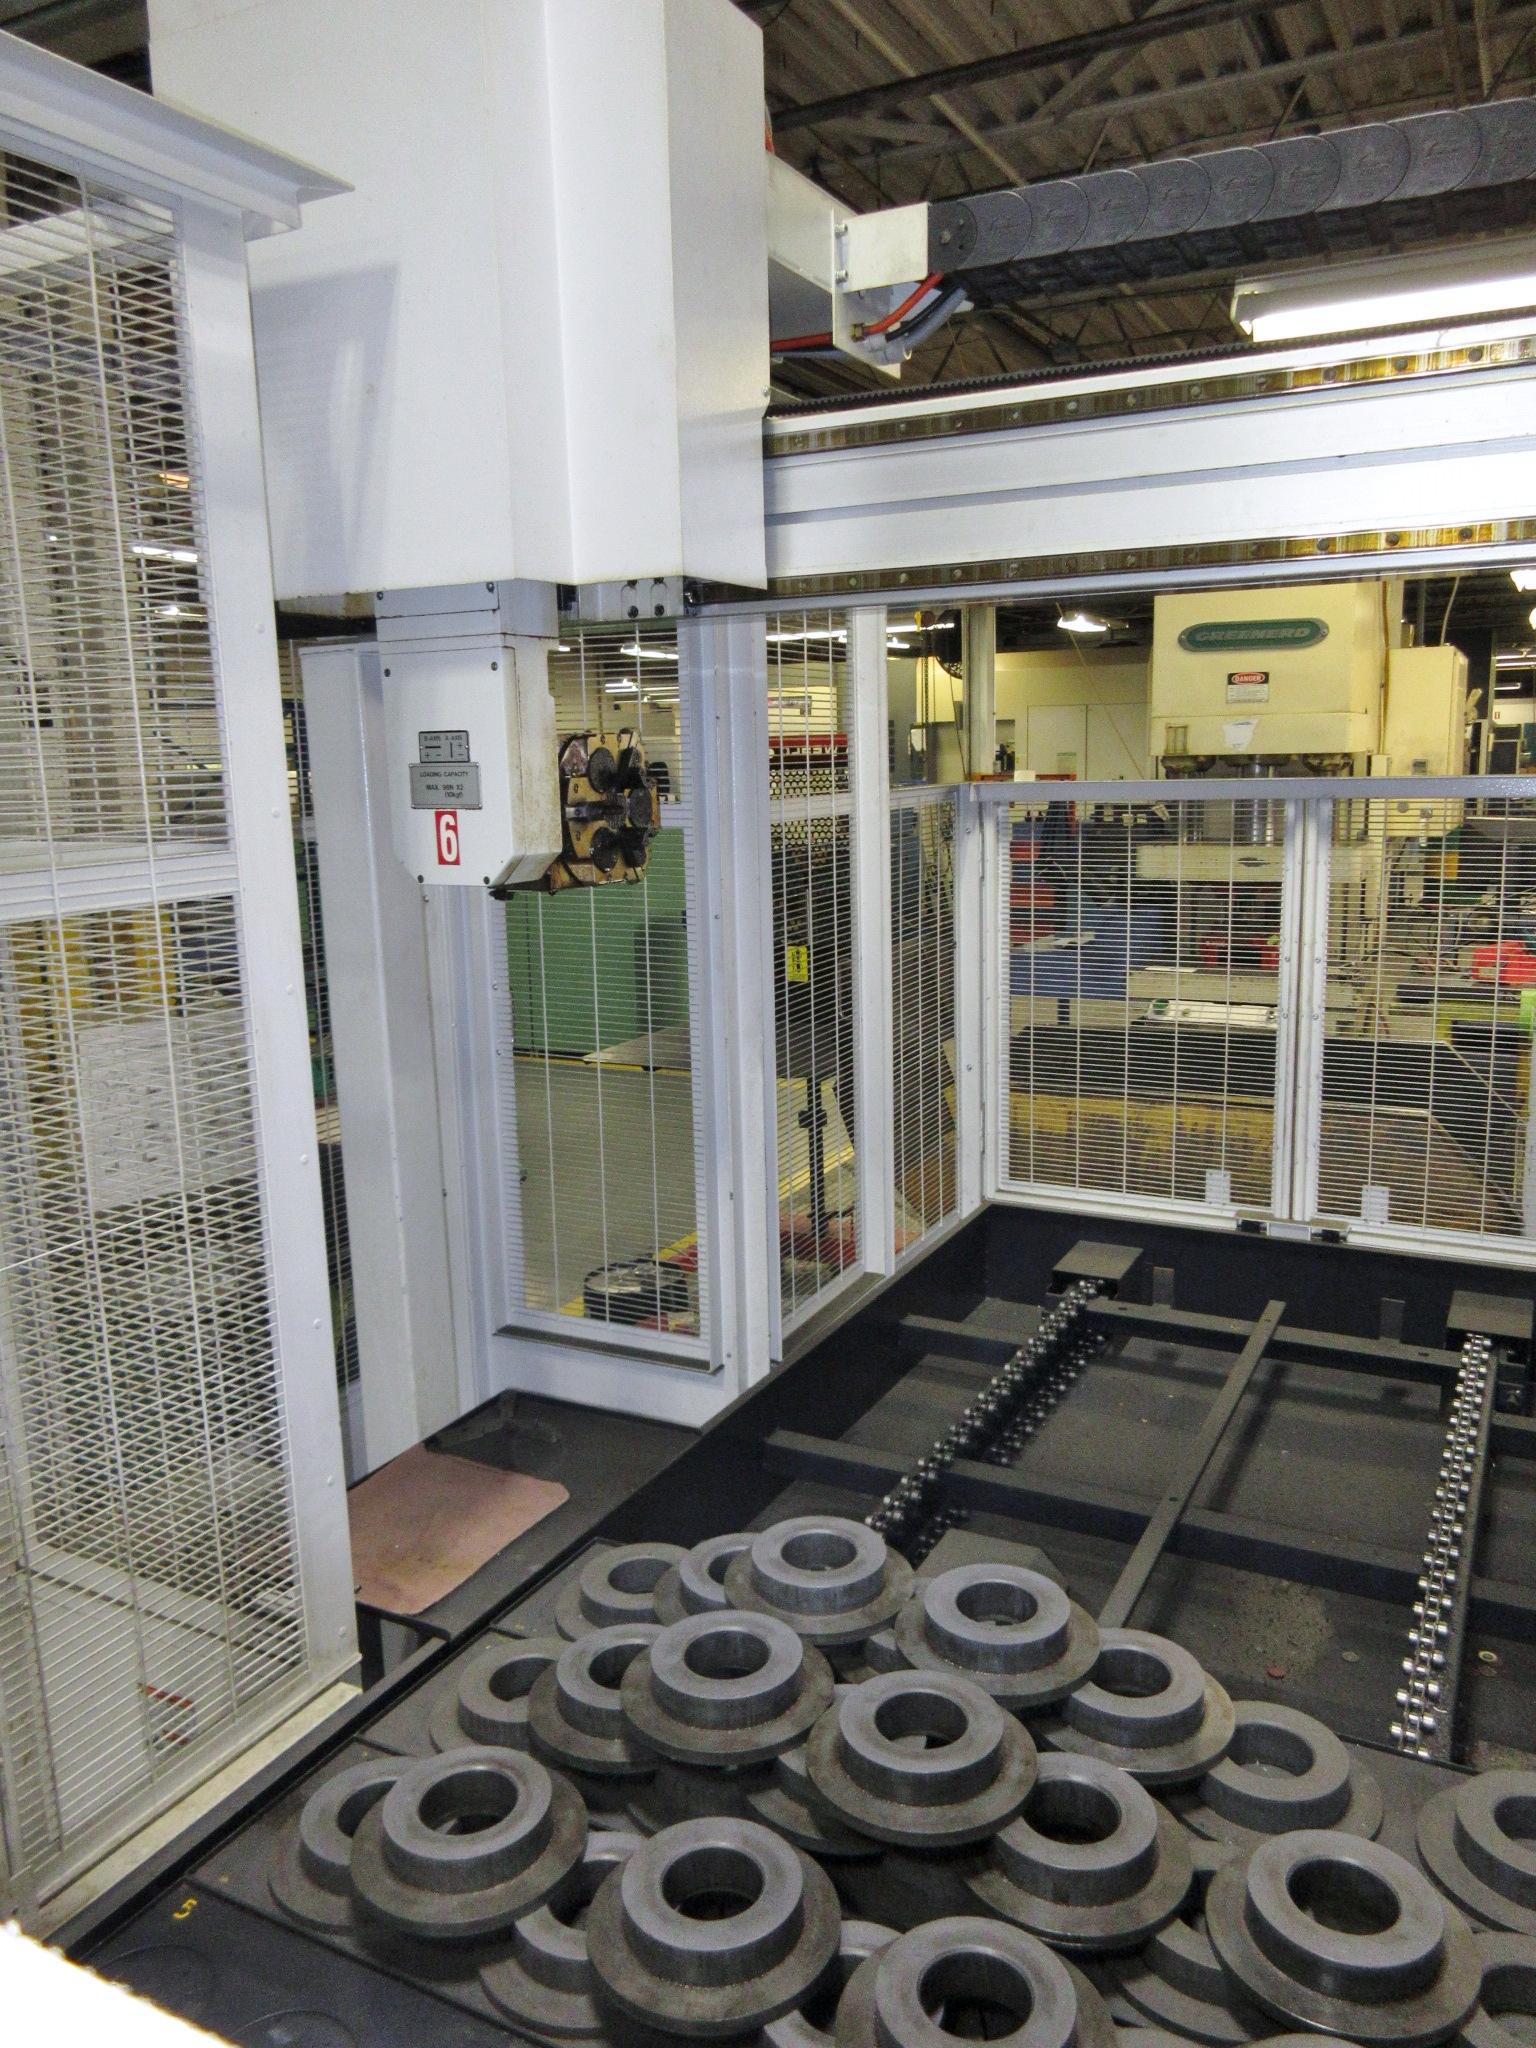 MAZAK QUICK TURN NEXUS 250-II MSY CNC TURNING CENTER - Image 11 of 16